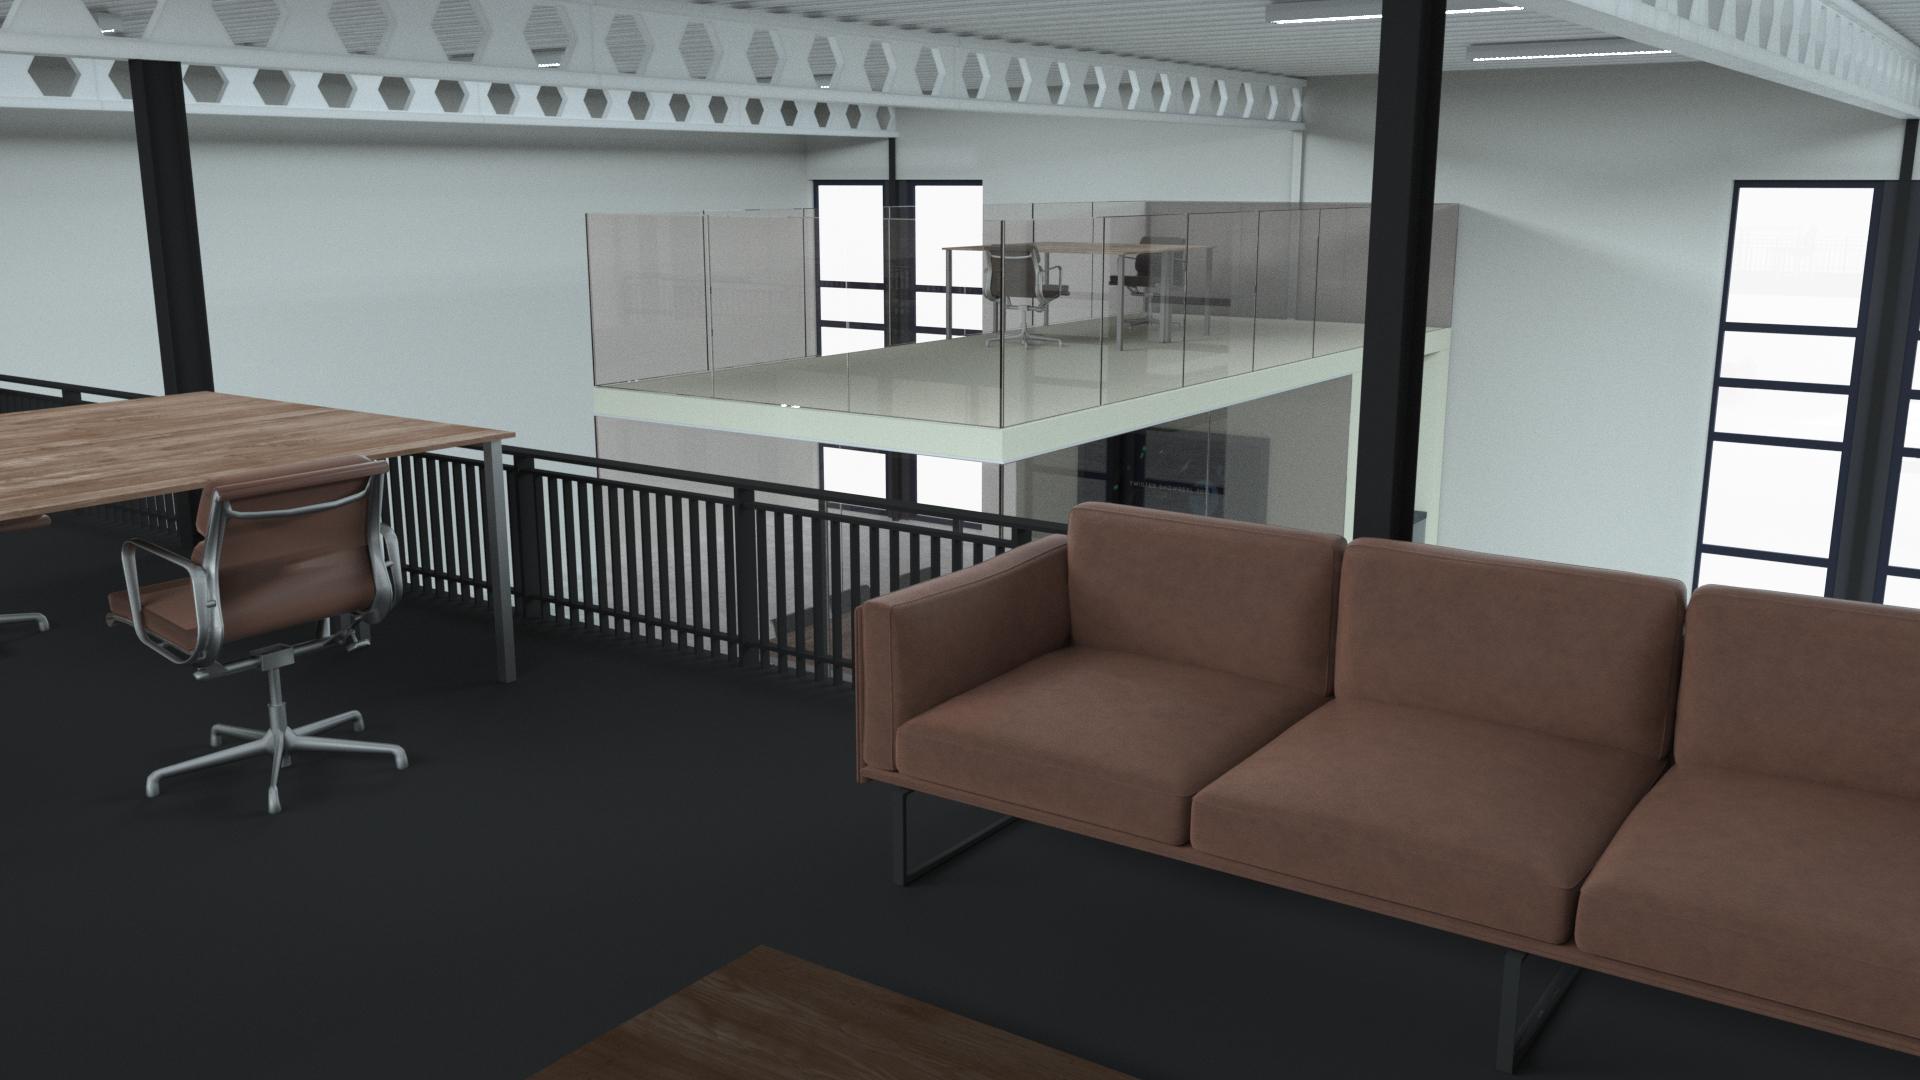 Hal_atelier_kantoor_optie2_00009.jpg